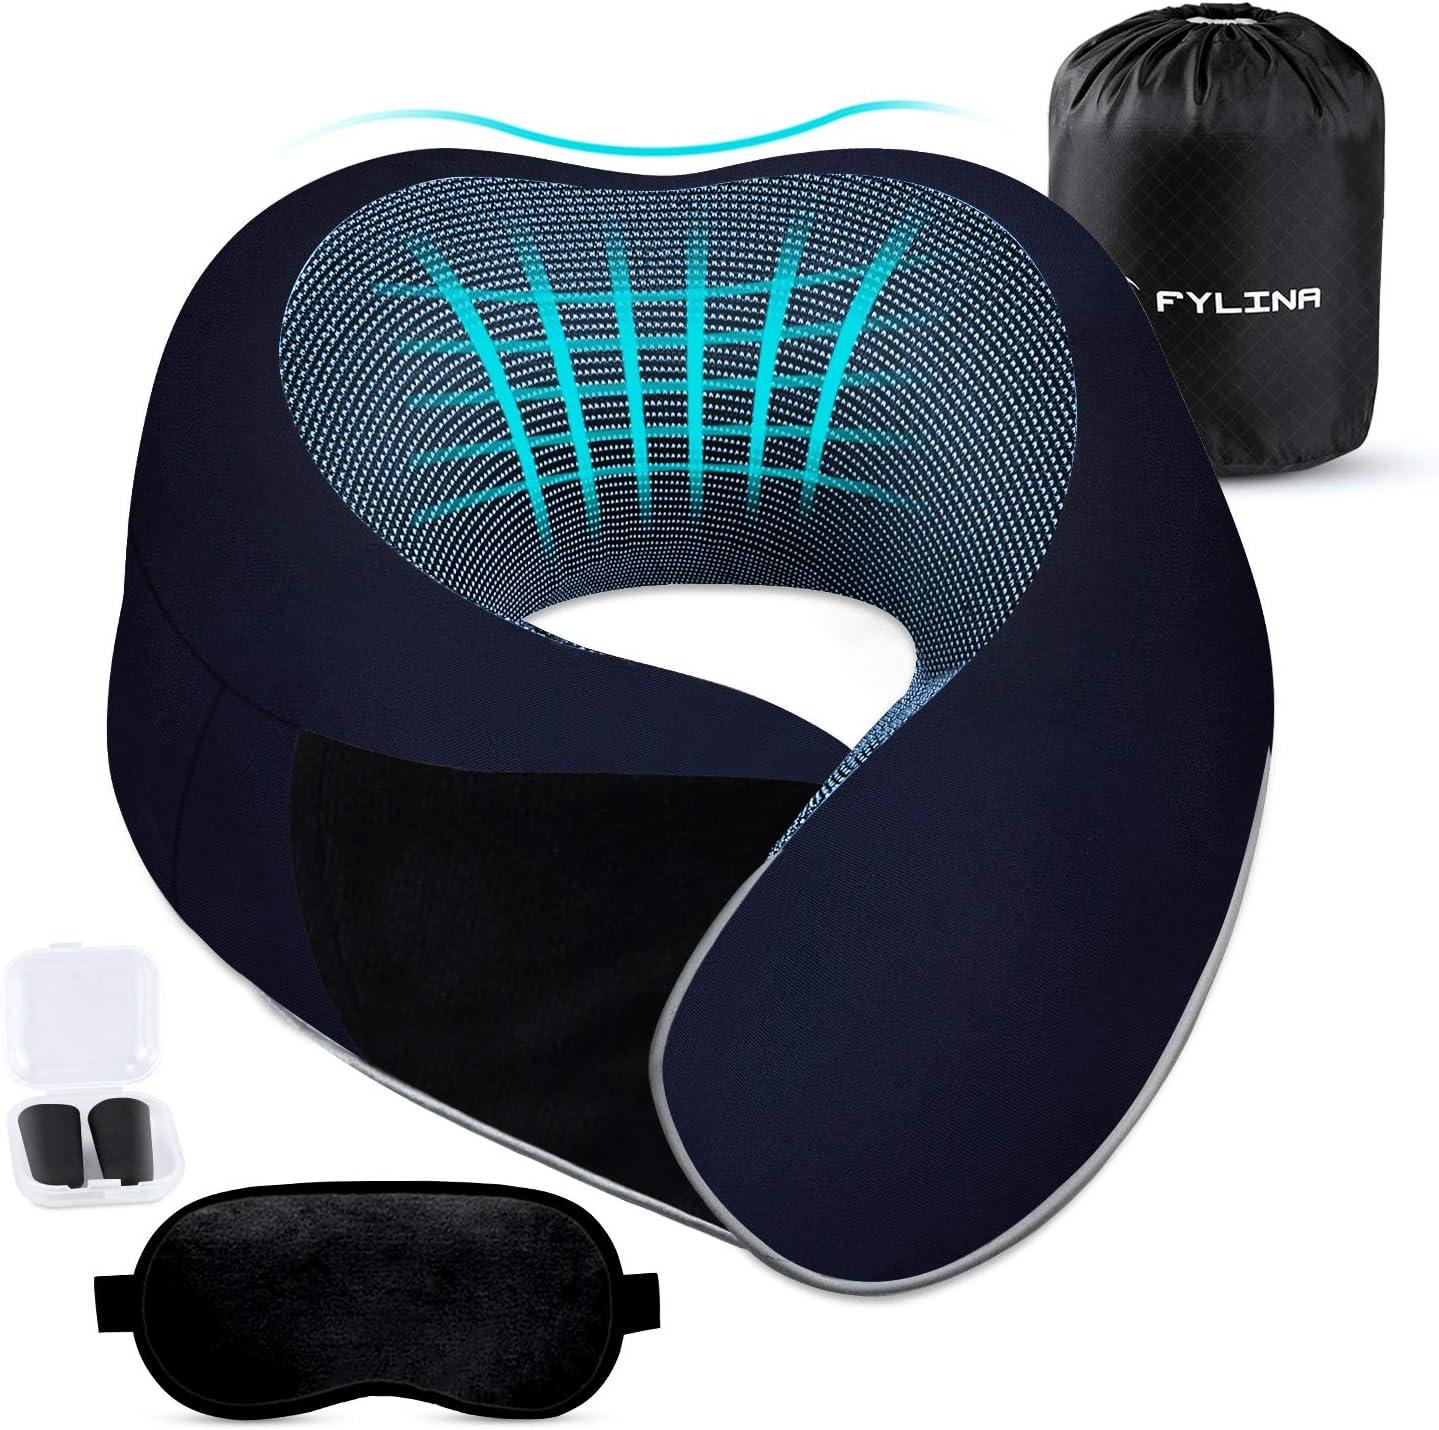 FYLINA Updated Travel Pillow, Memory